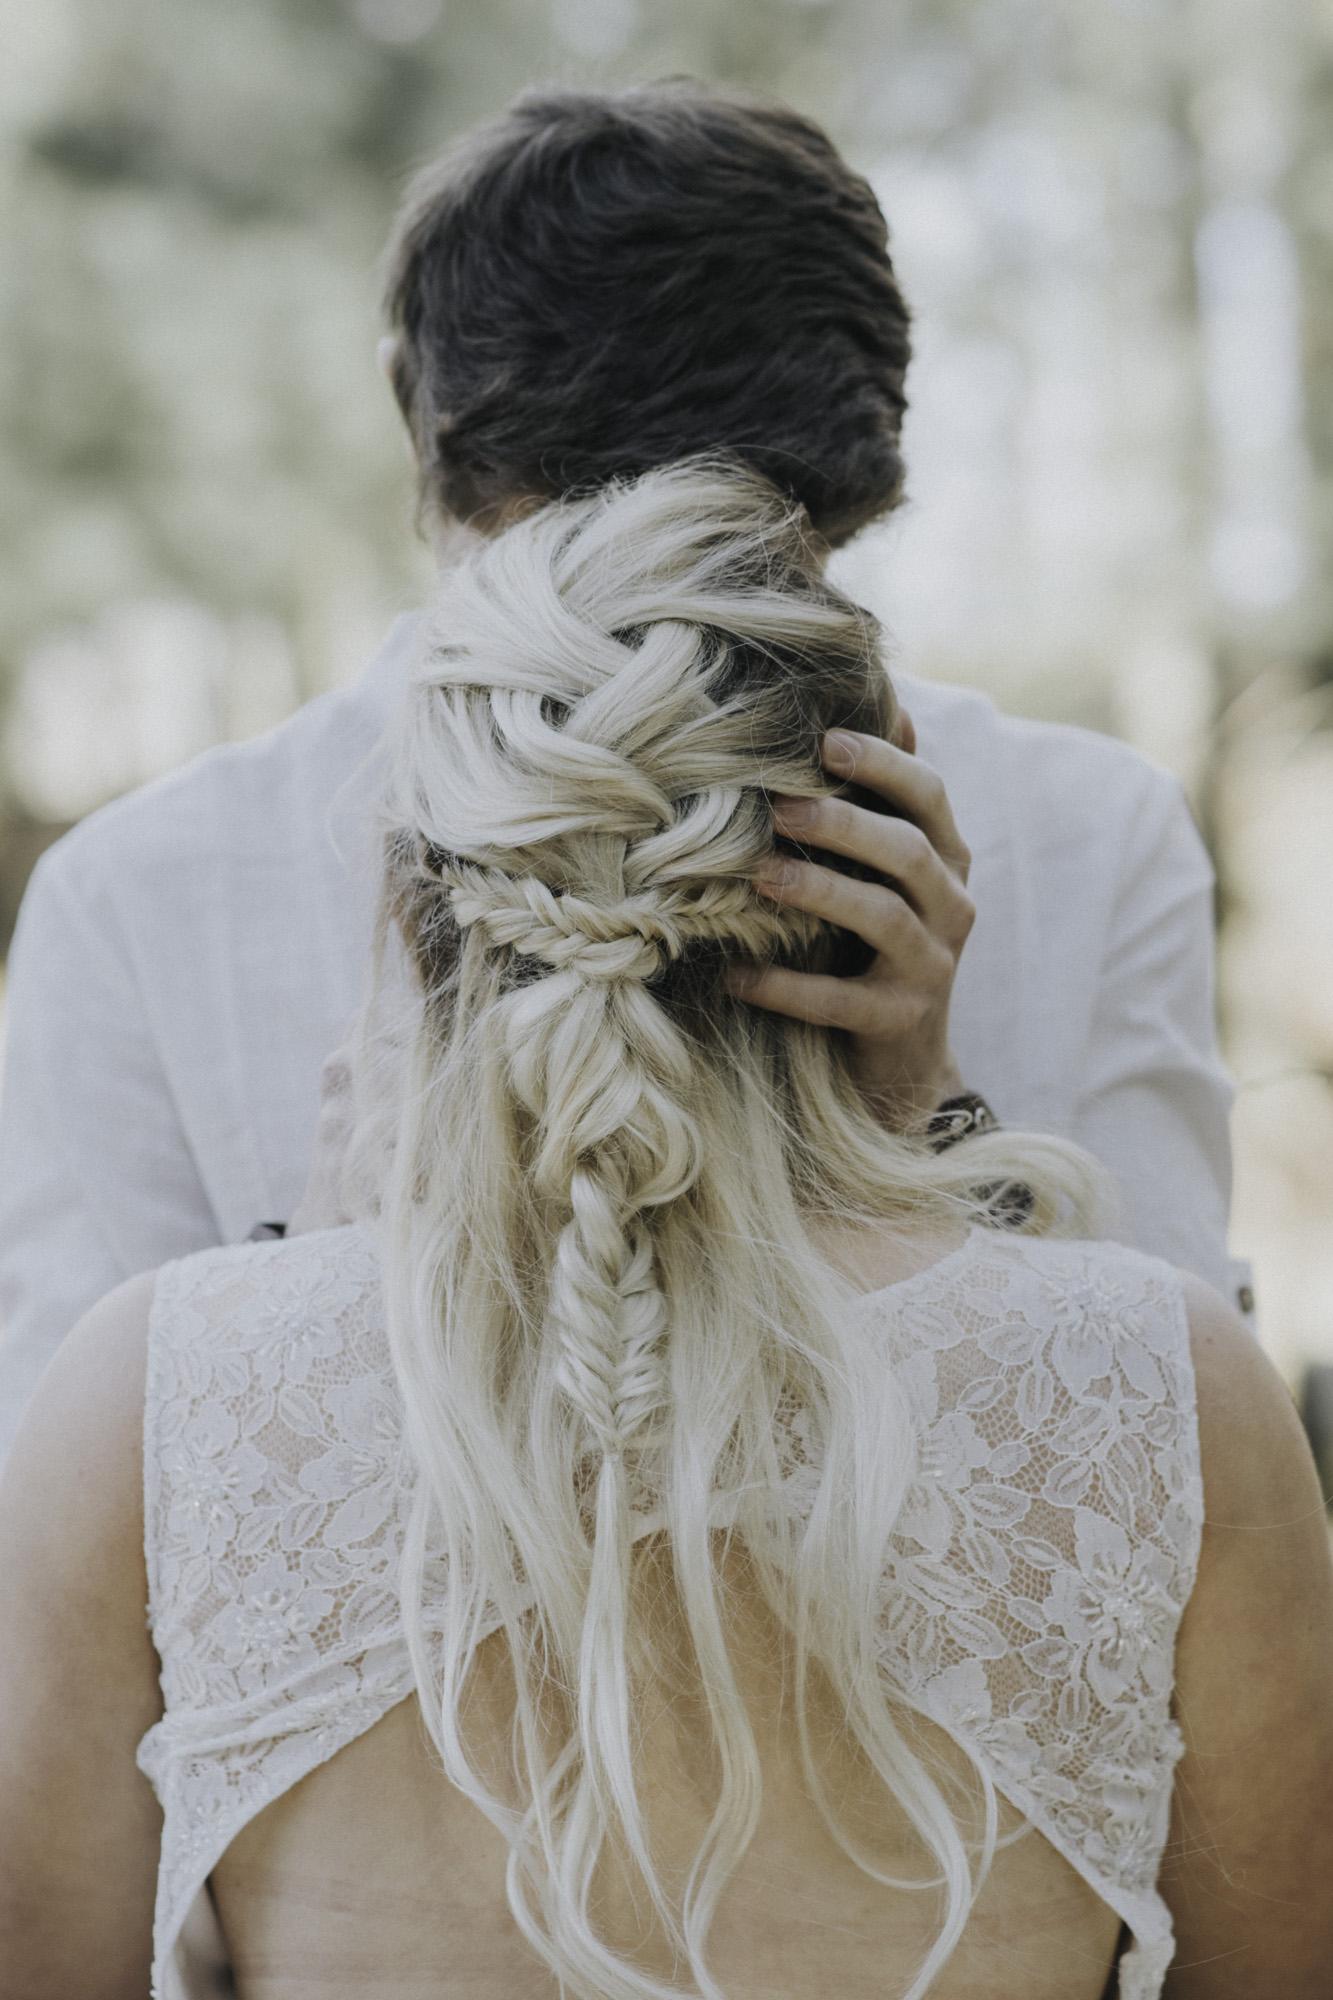 Cate_Ann_Photography_Dayton_Ohio_Wedding_Elopement_And_Engagement_PhotographerDSC_6366.jpg